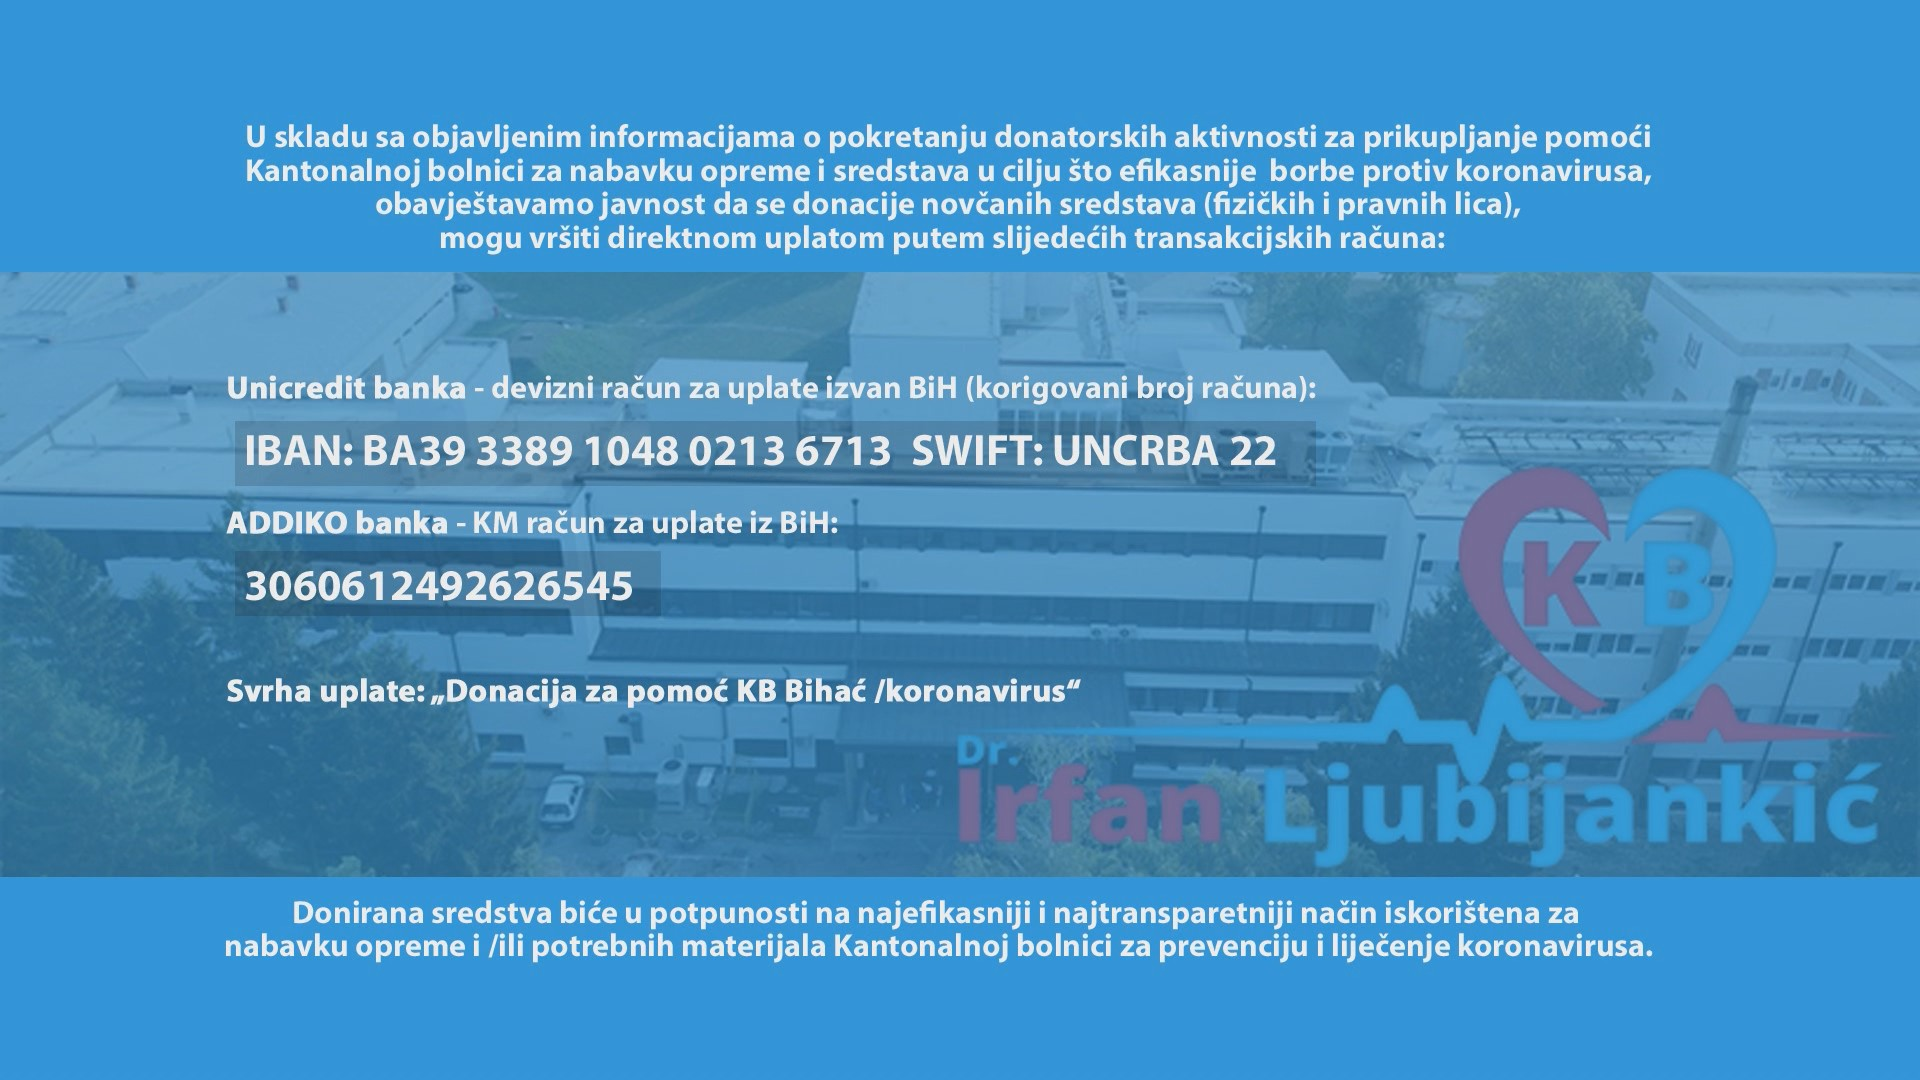 DONACIJA ZA POMOĆ KB DR IRFAN LJUBIJANKIĆ BIHAĆ / KORONAVIRUS